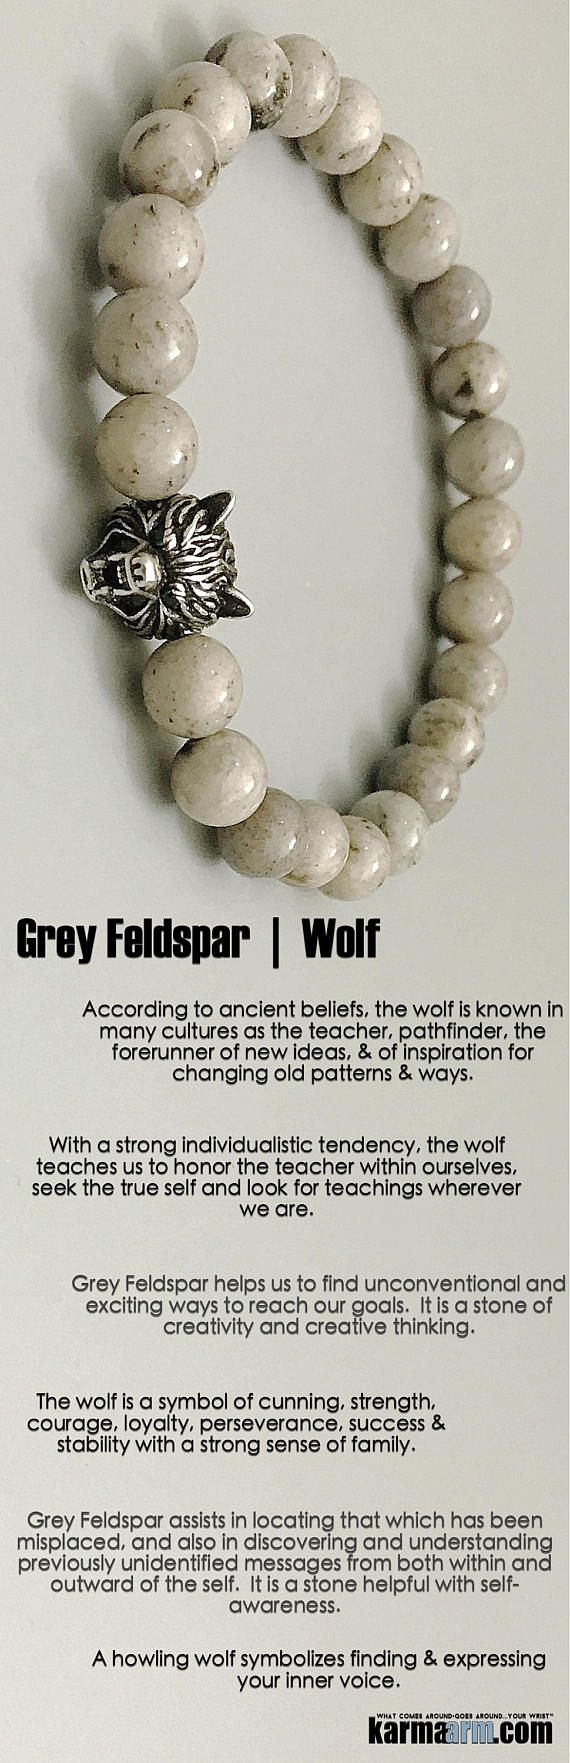 The#wolfis a symbol of cunning, #strength, #courage, #loyalty, perseverance, #success & stability with a strong sense of #family.    #Beaded #Beads #Bijoux #Bracelet #Bracelets #Buddhist #Chakra #Charm #Crystals #Energy #gifts #gratitude #Handmade #Healing #Jewelry #Kundalini #LawOfAttraction #LOA #Love #Mala #Meditation #Mens #prayer #pulseiras #Reiki #Spiritual #Stacks #Stretch #Womens #Yoga #YogaBracelets #prayer